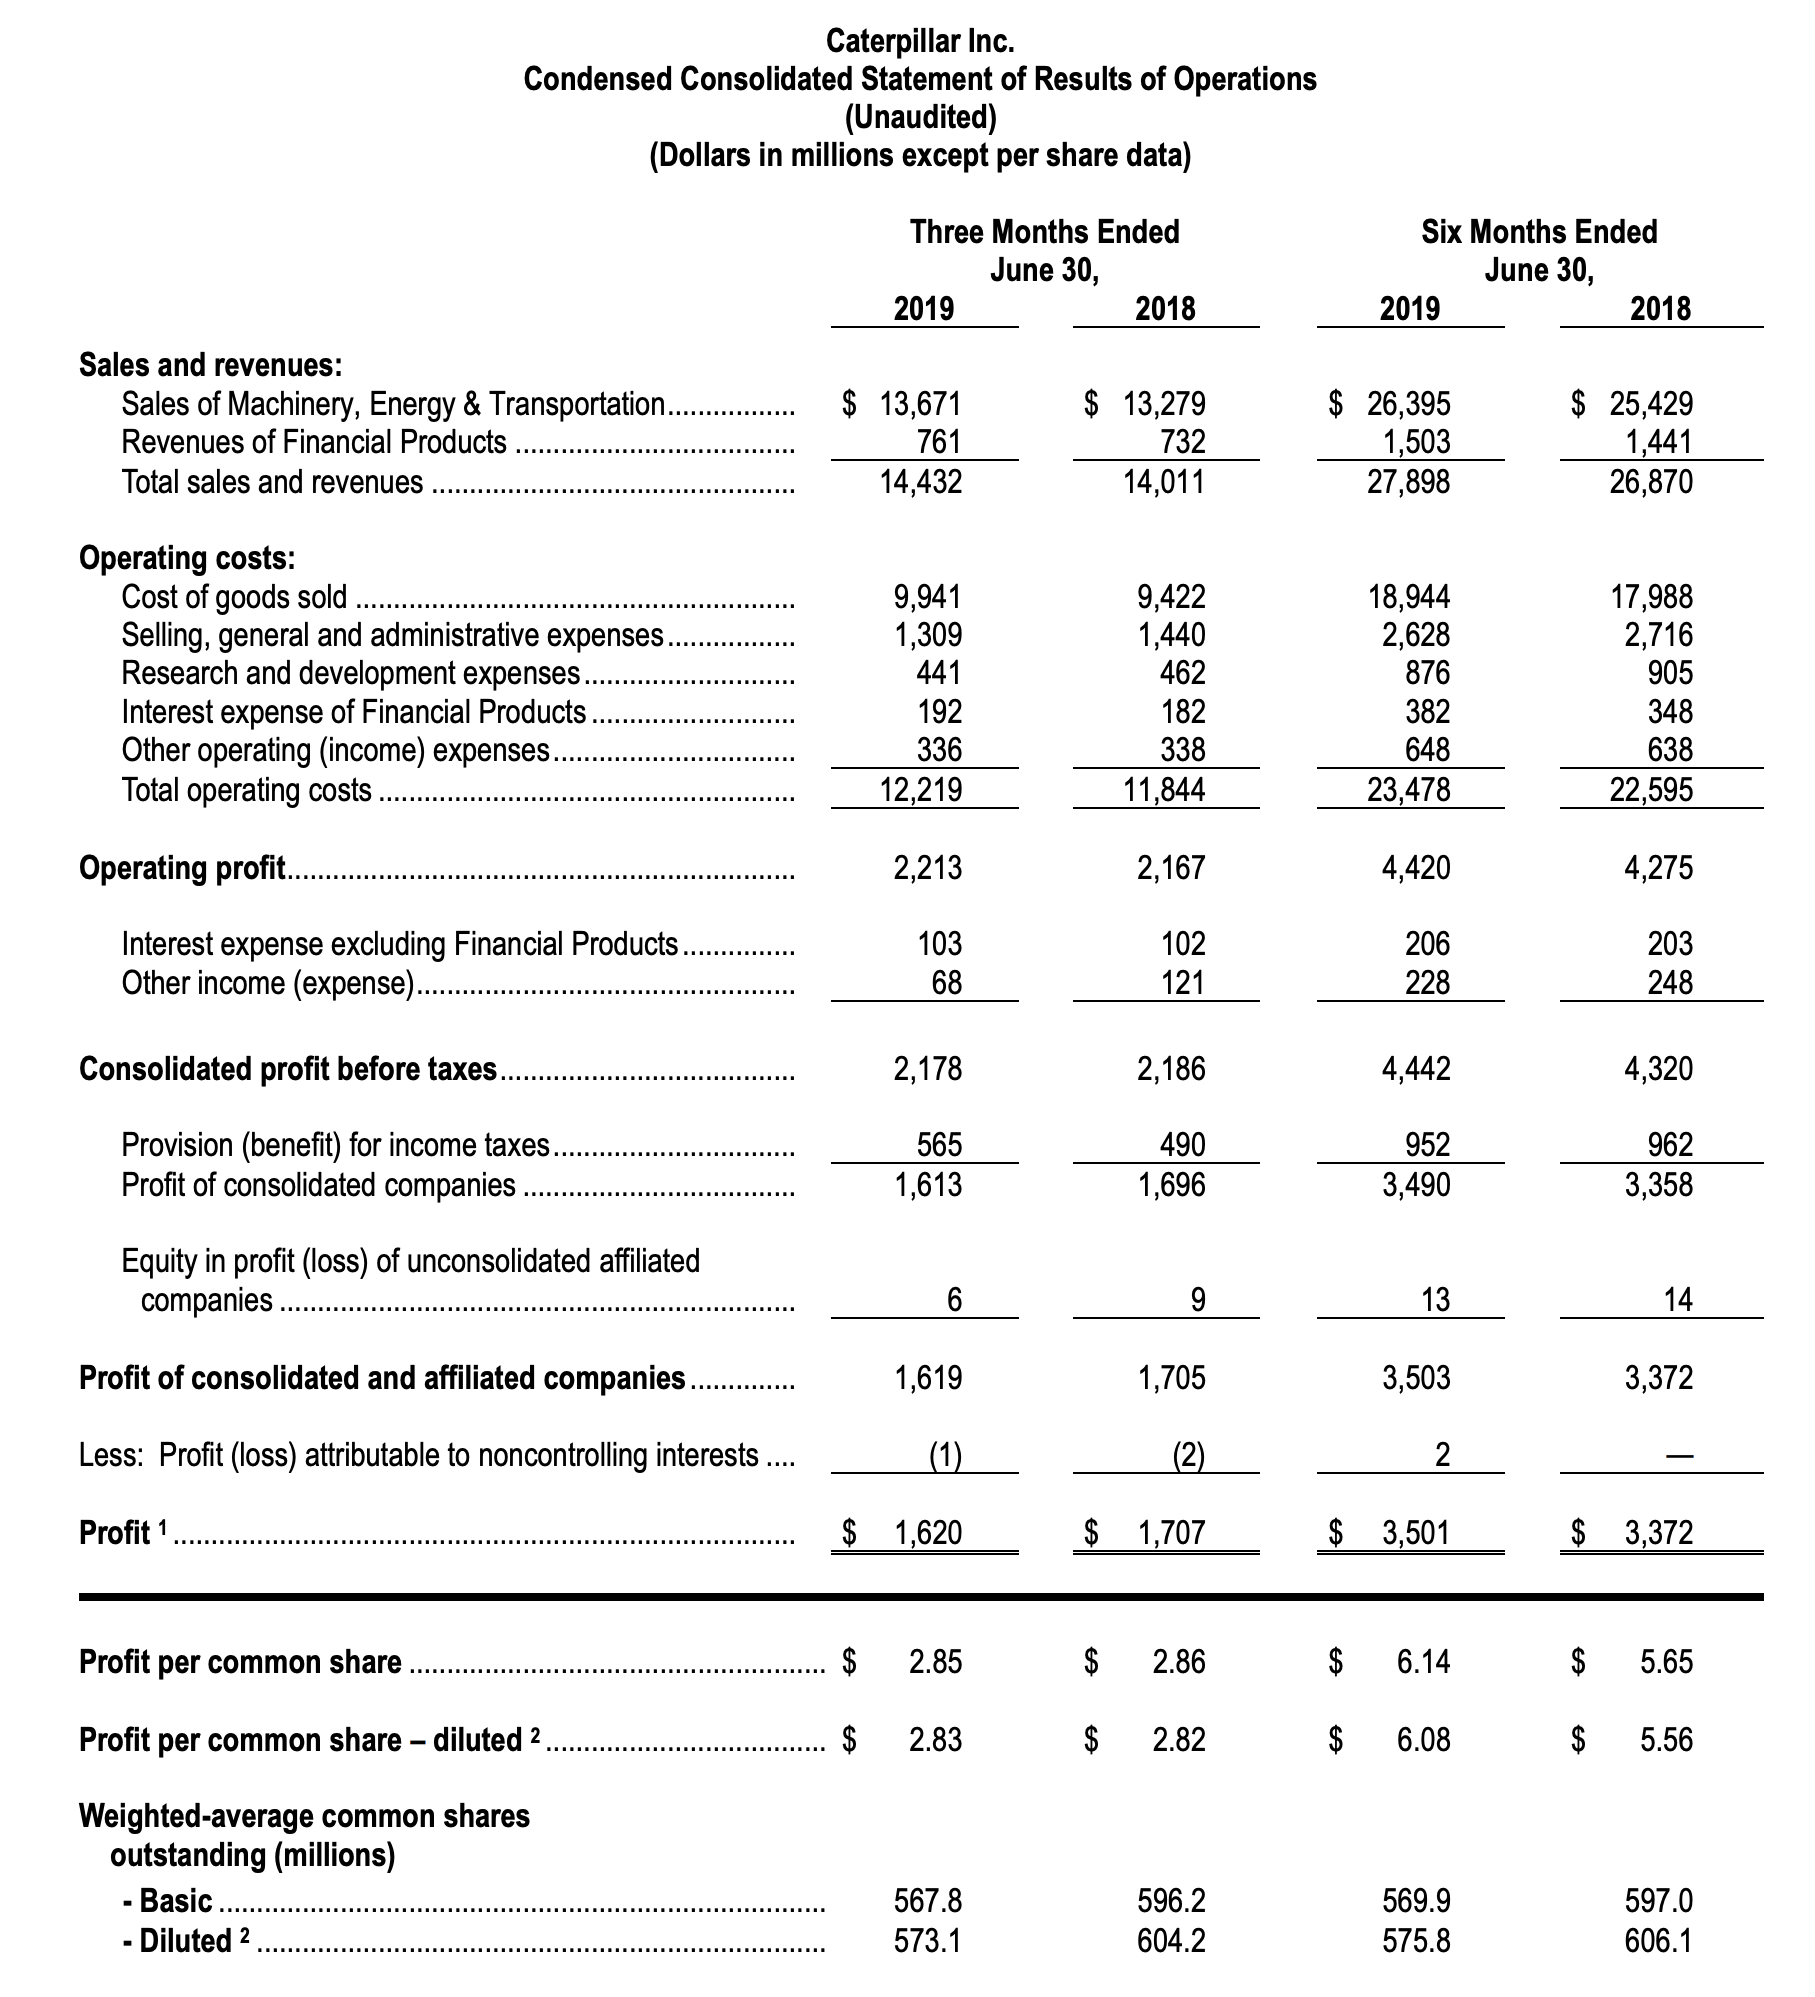 Caterpillar-Quartalszahlen